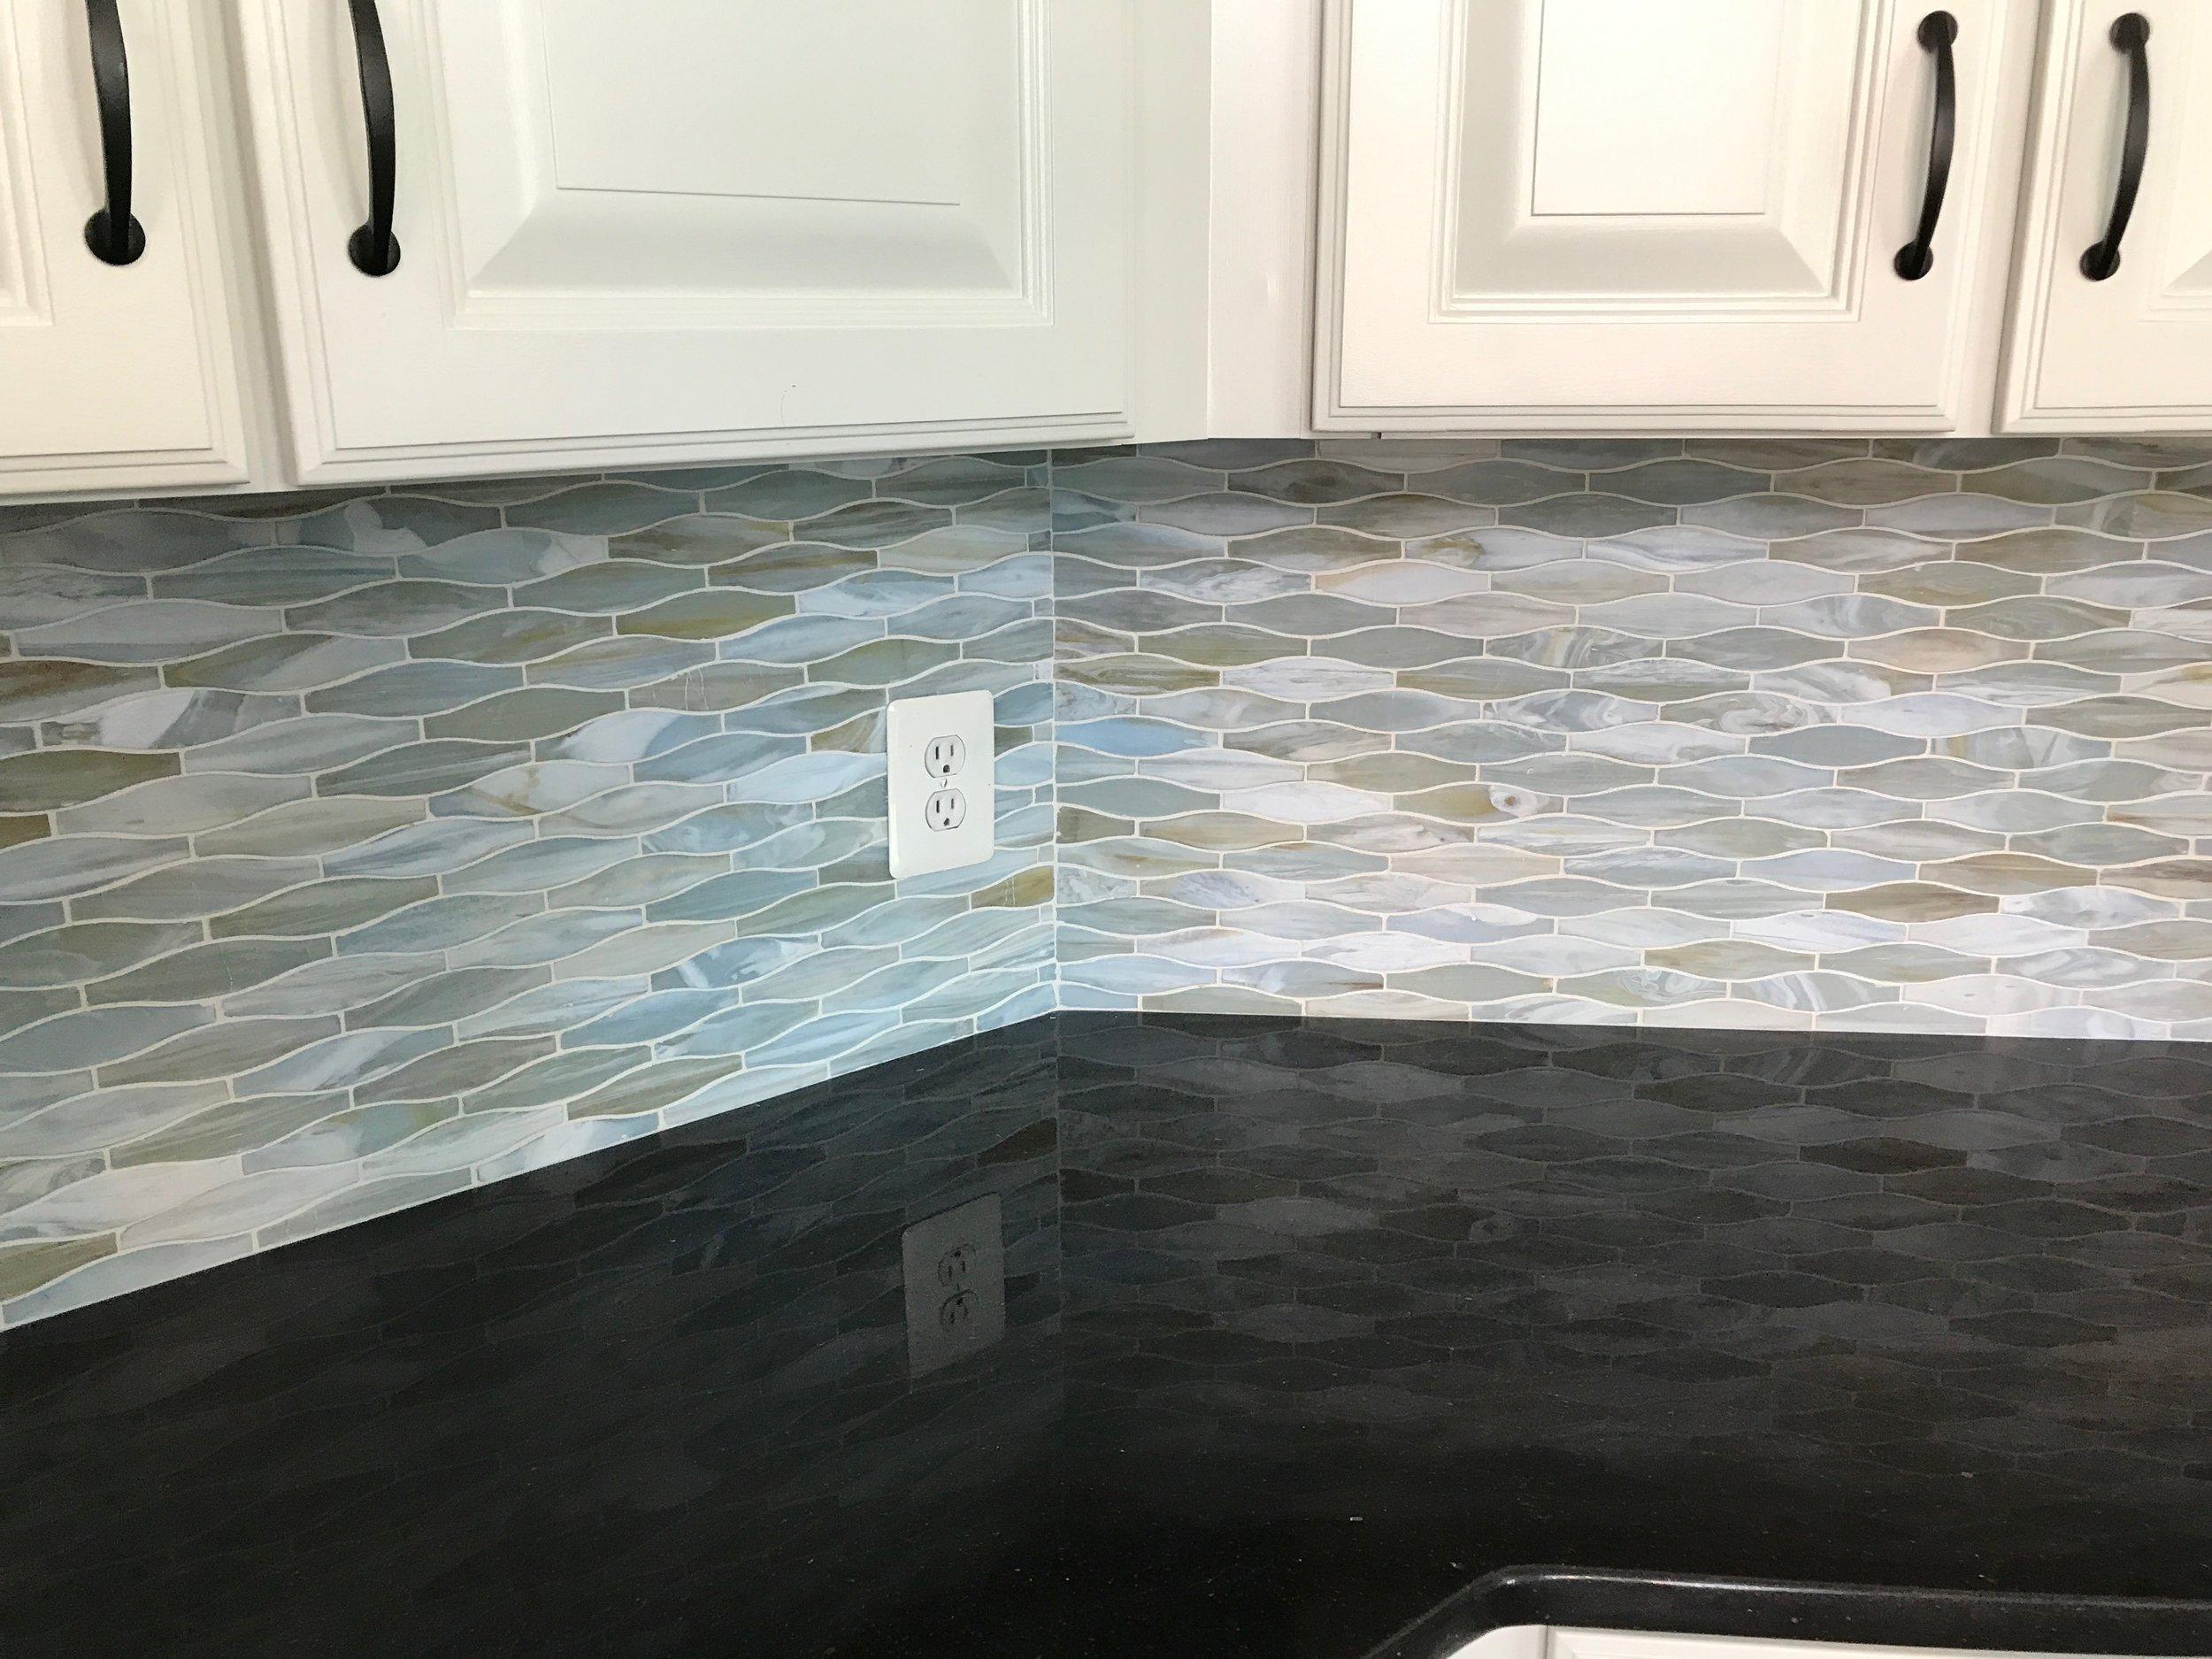 reston kitchen backsplash tile.JPG